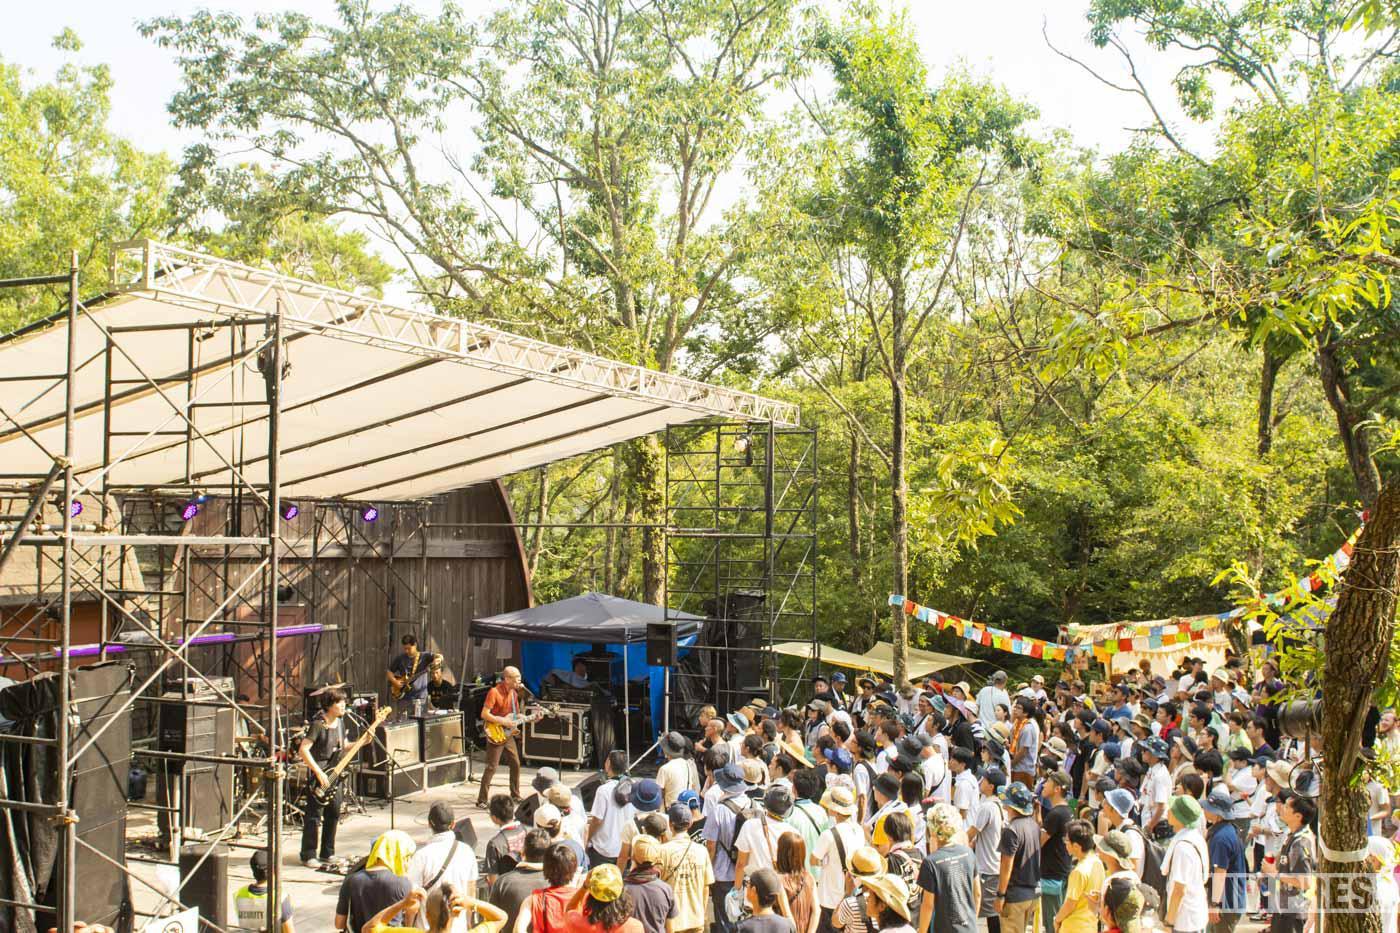 eastern youth | 兵庫 ONE MUSIC CAMP | 2019.08.25